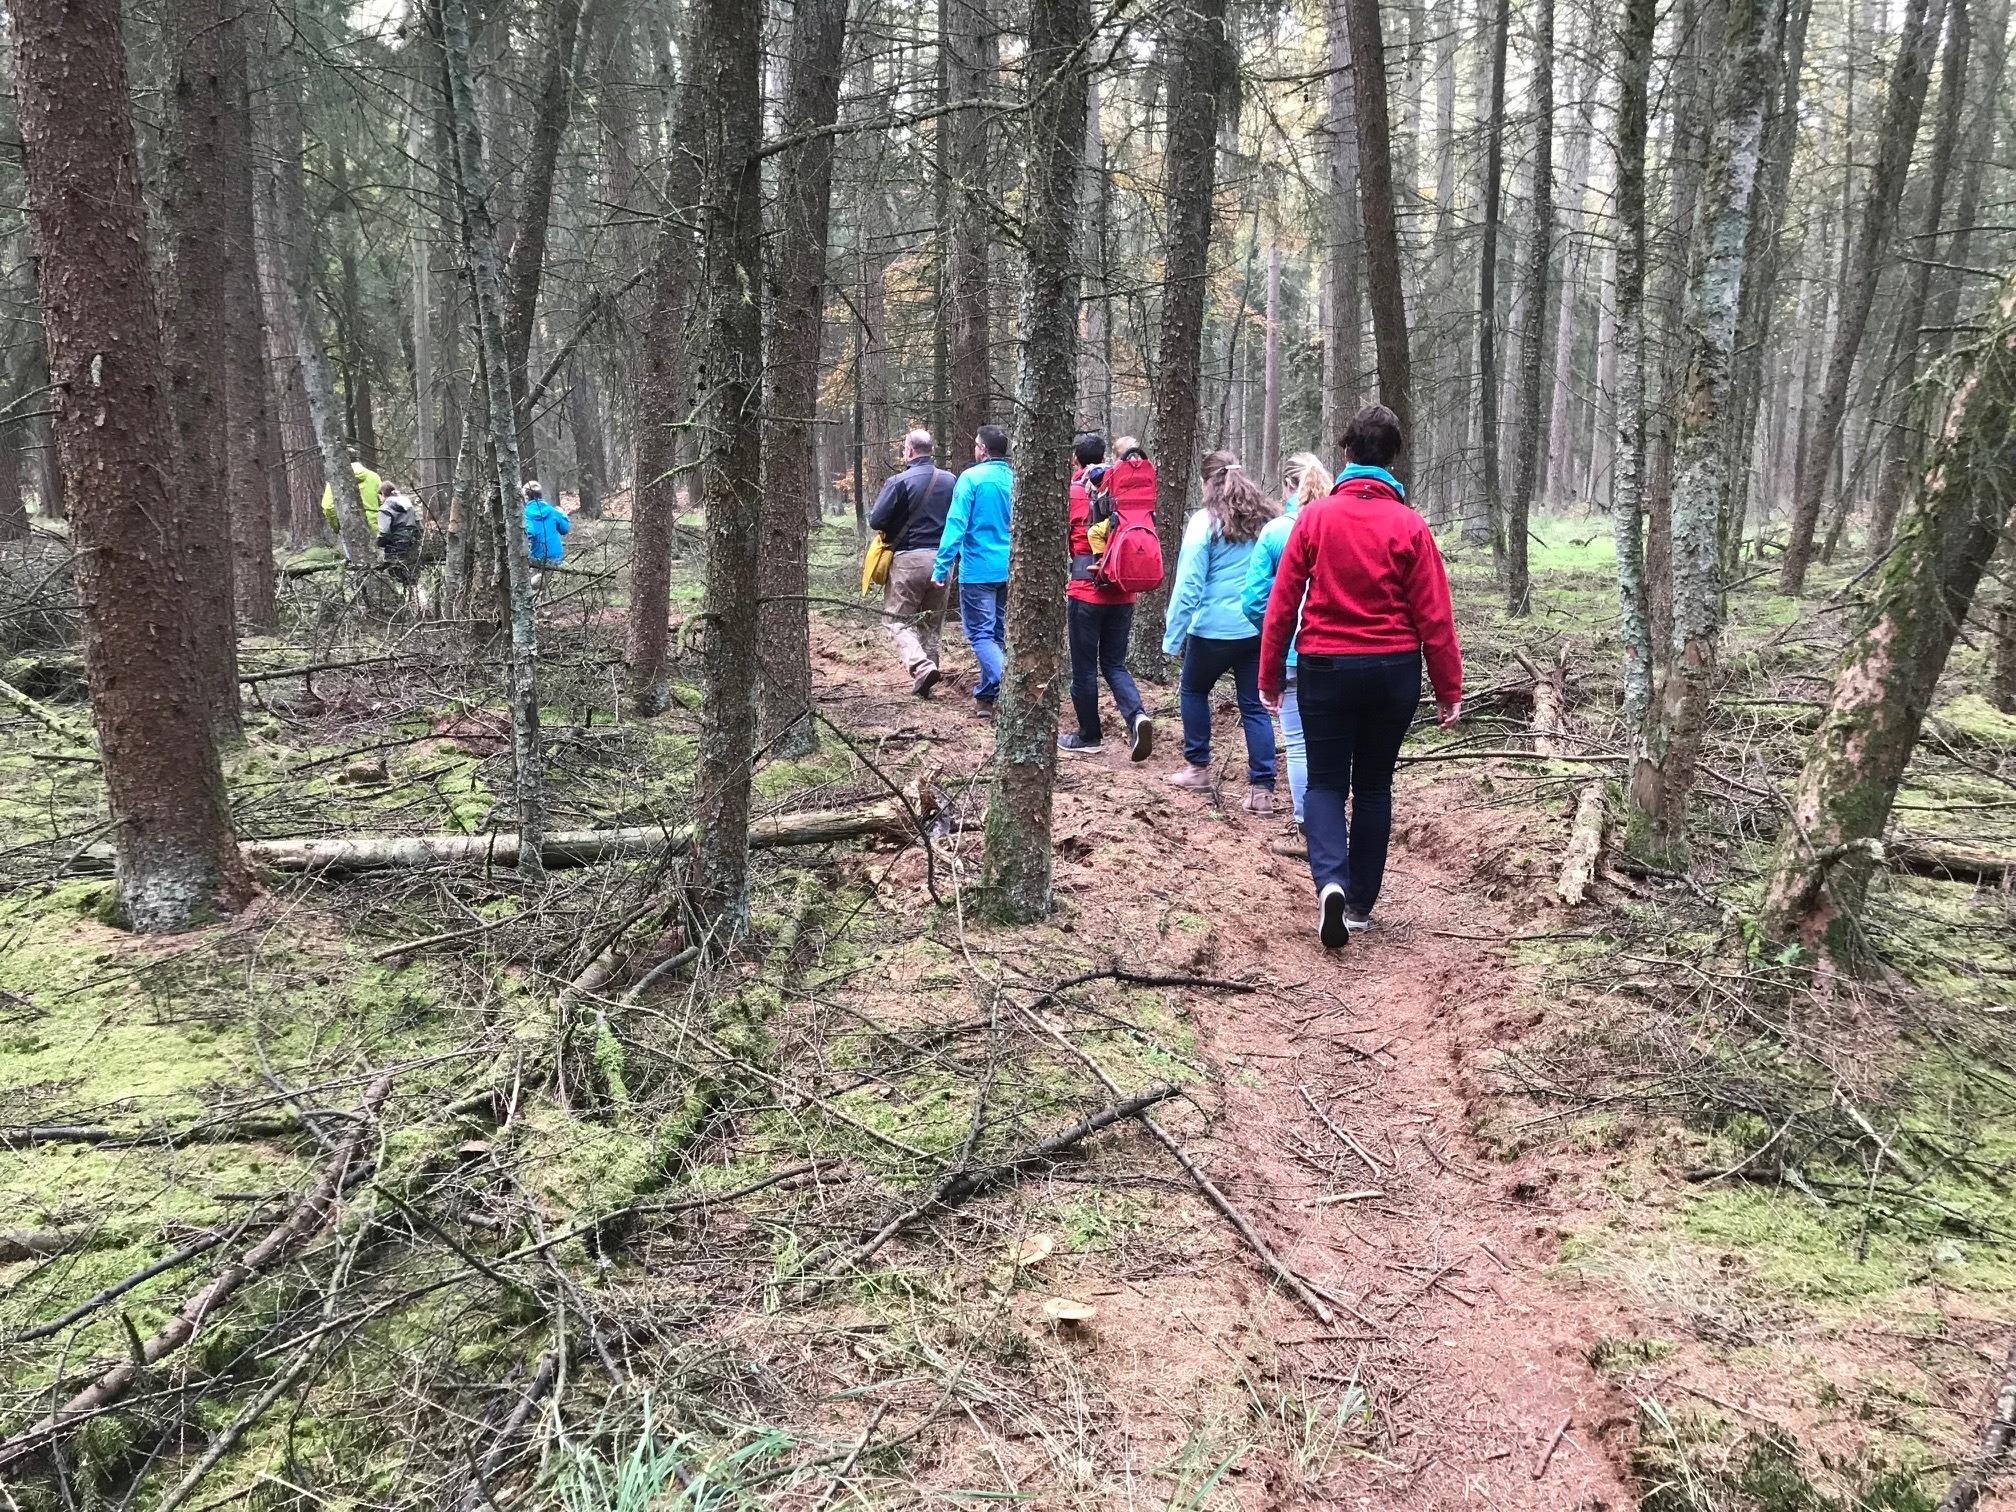 Mindful Walk groep lopend over smal bemost bospad tussen hoge, smalle bomen